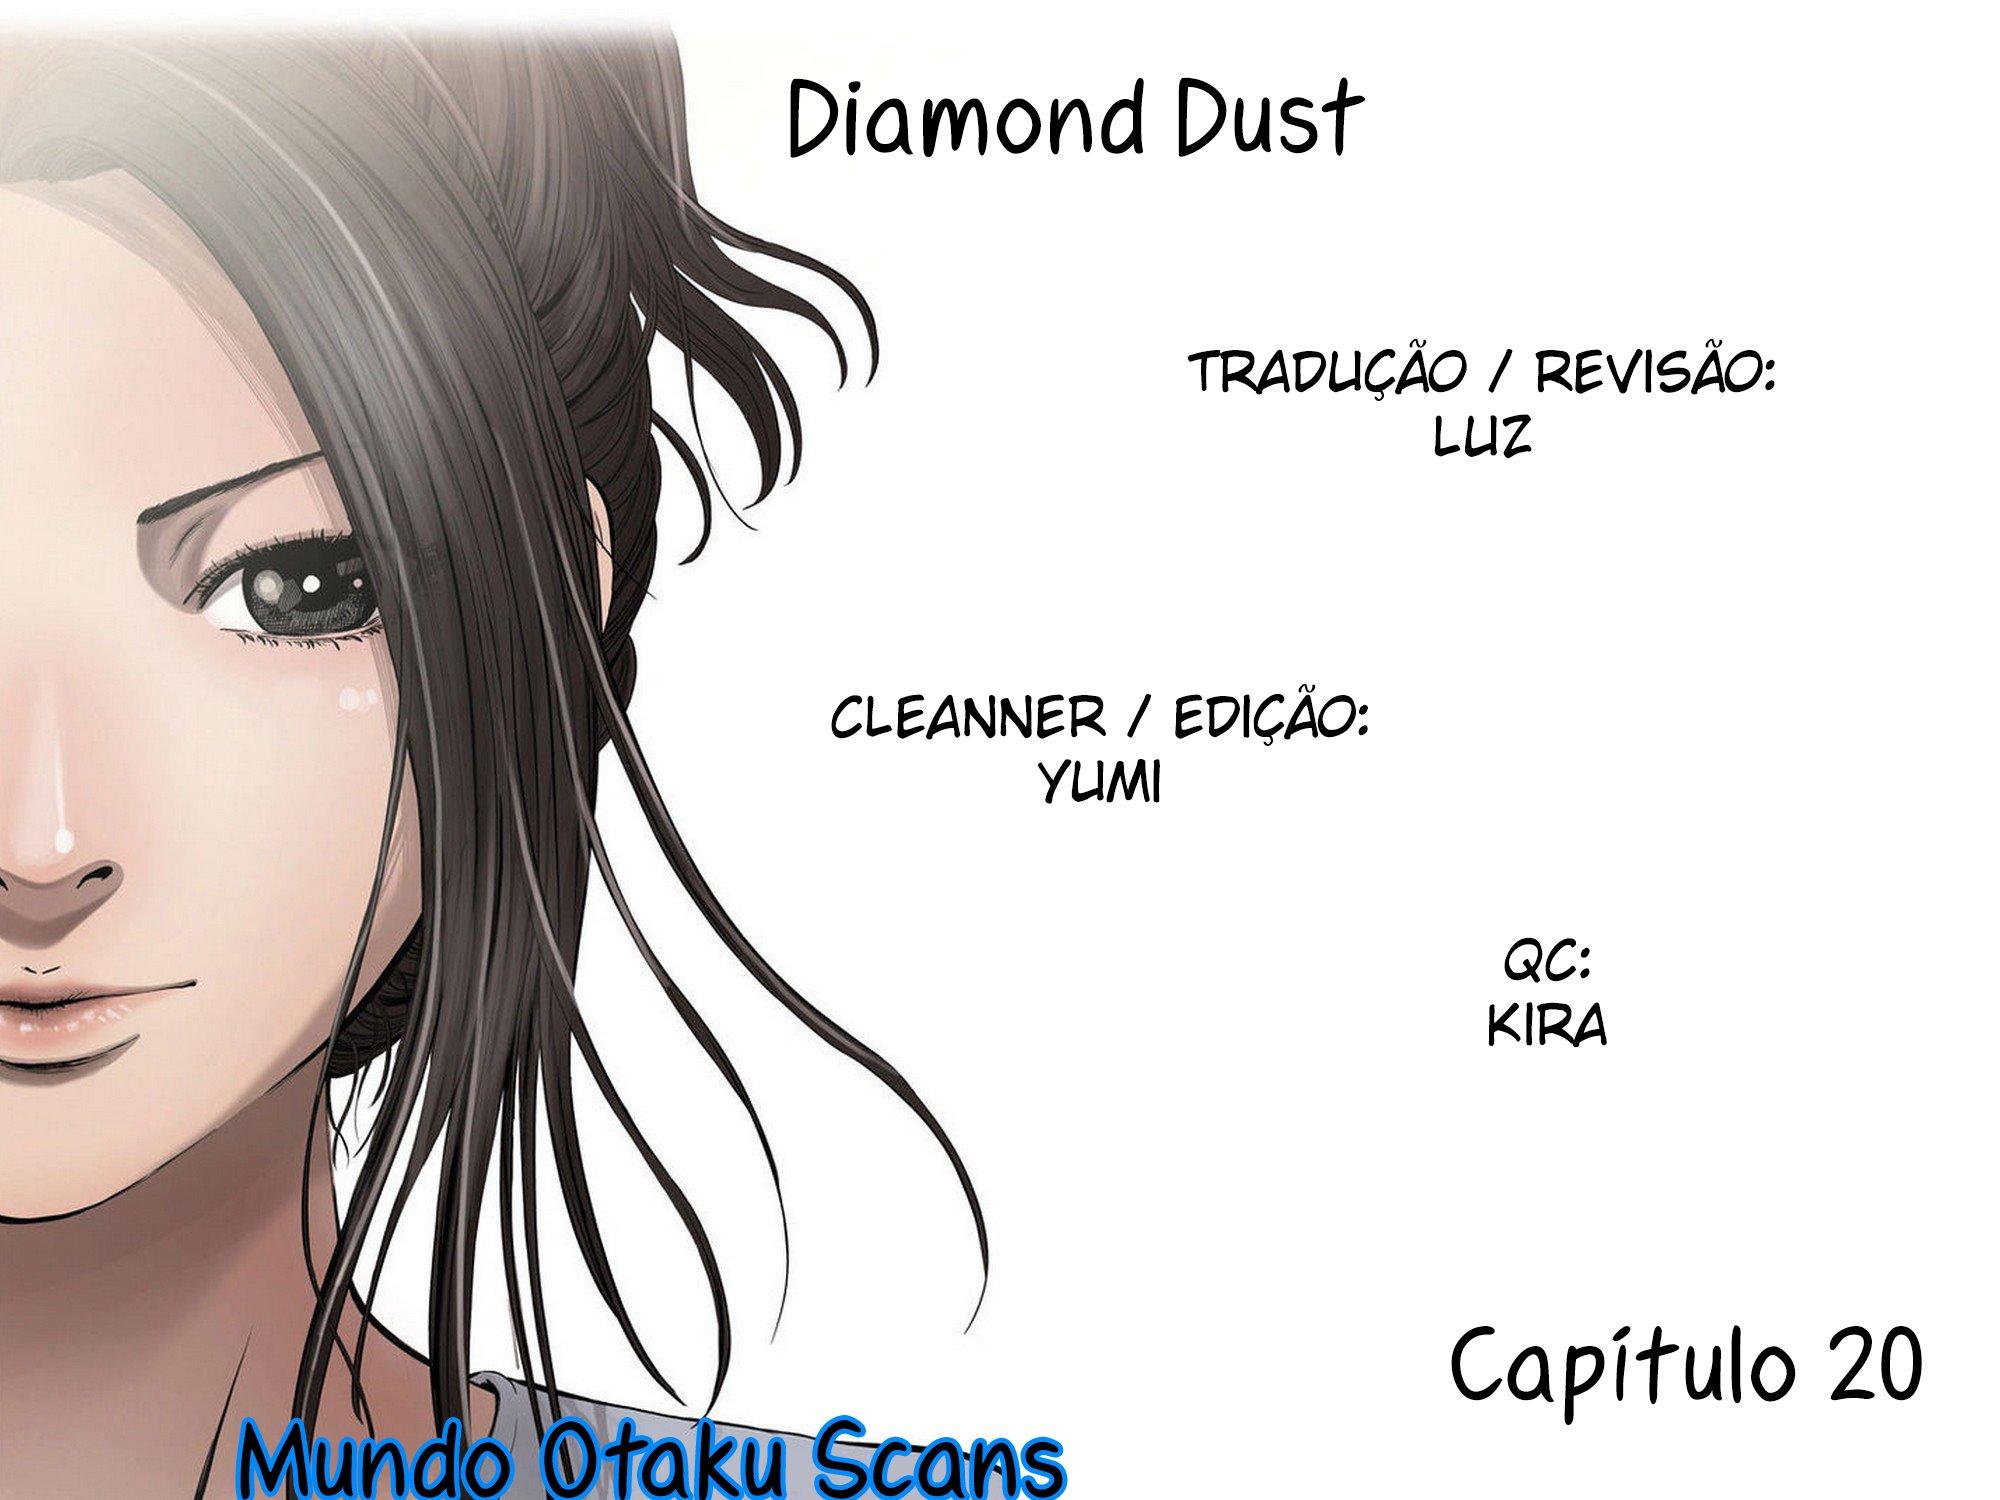 https://nine.mangadogs.com/br_manga/pic/8/328/1317282/DiamondDust020338.jpg Page 1